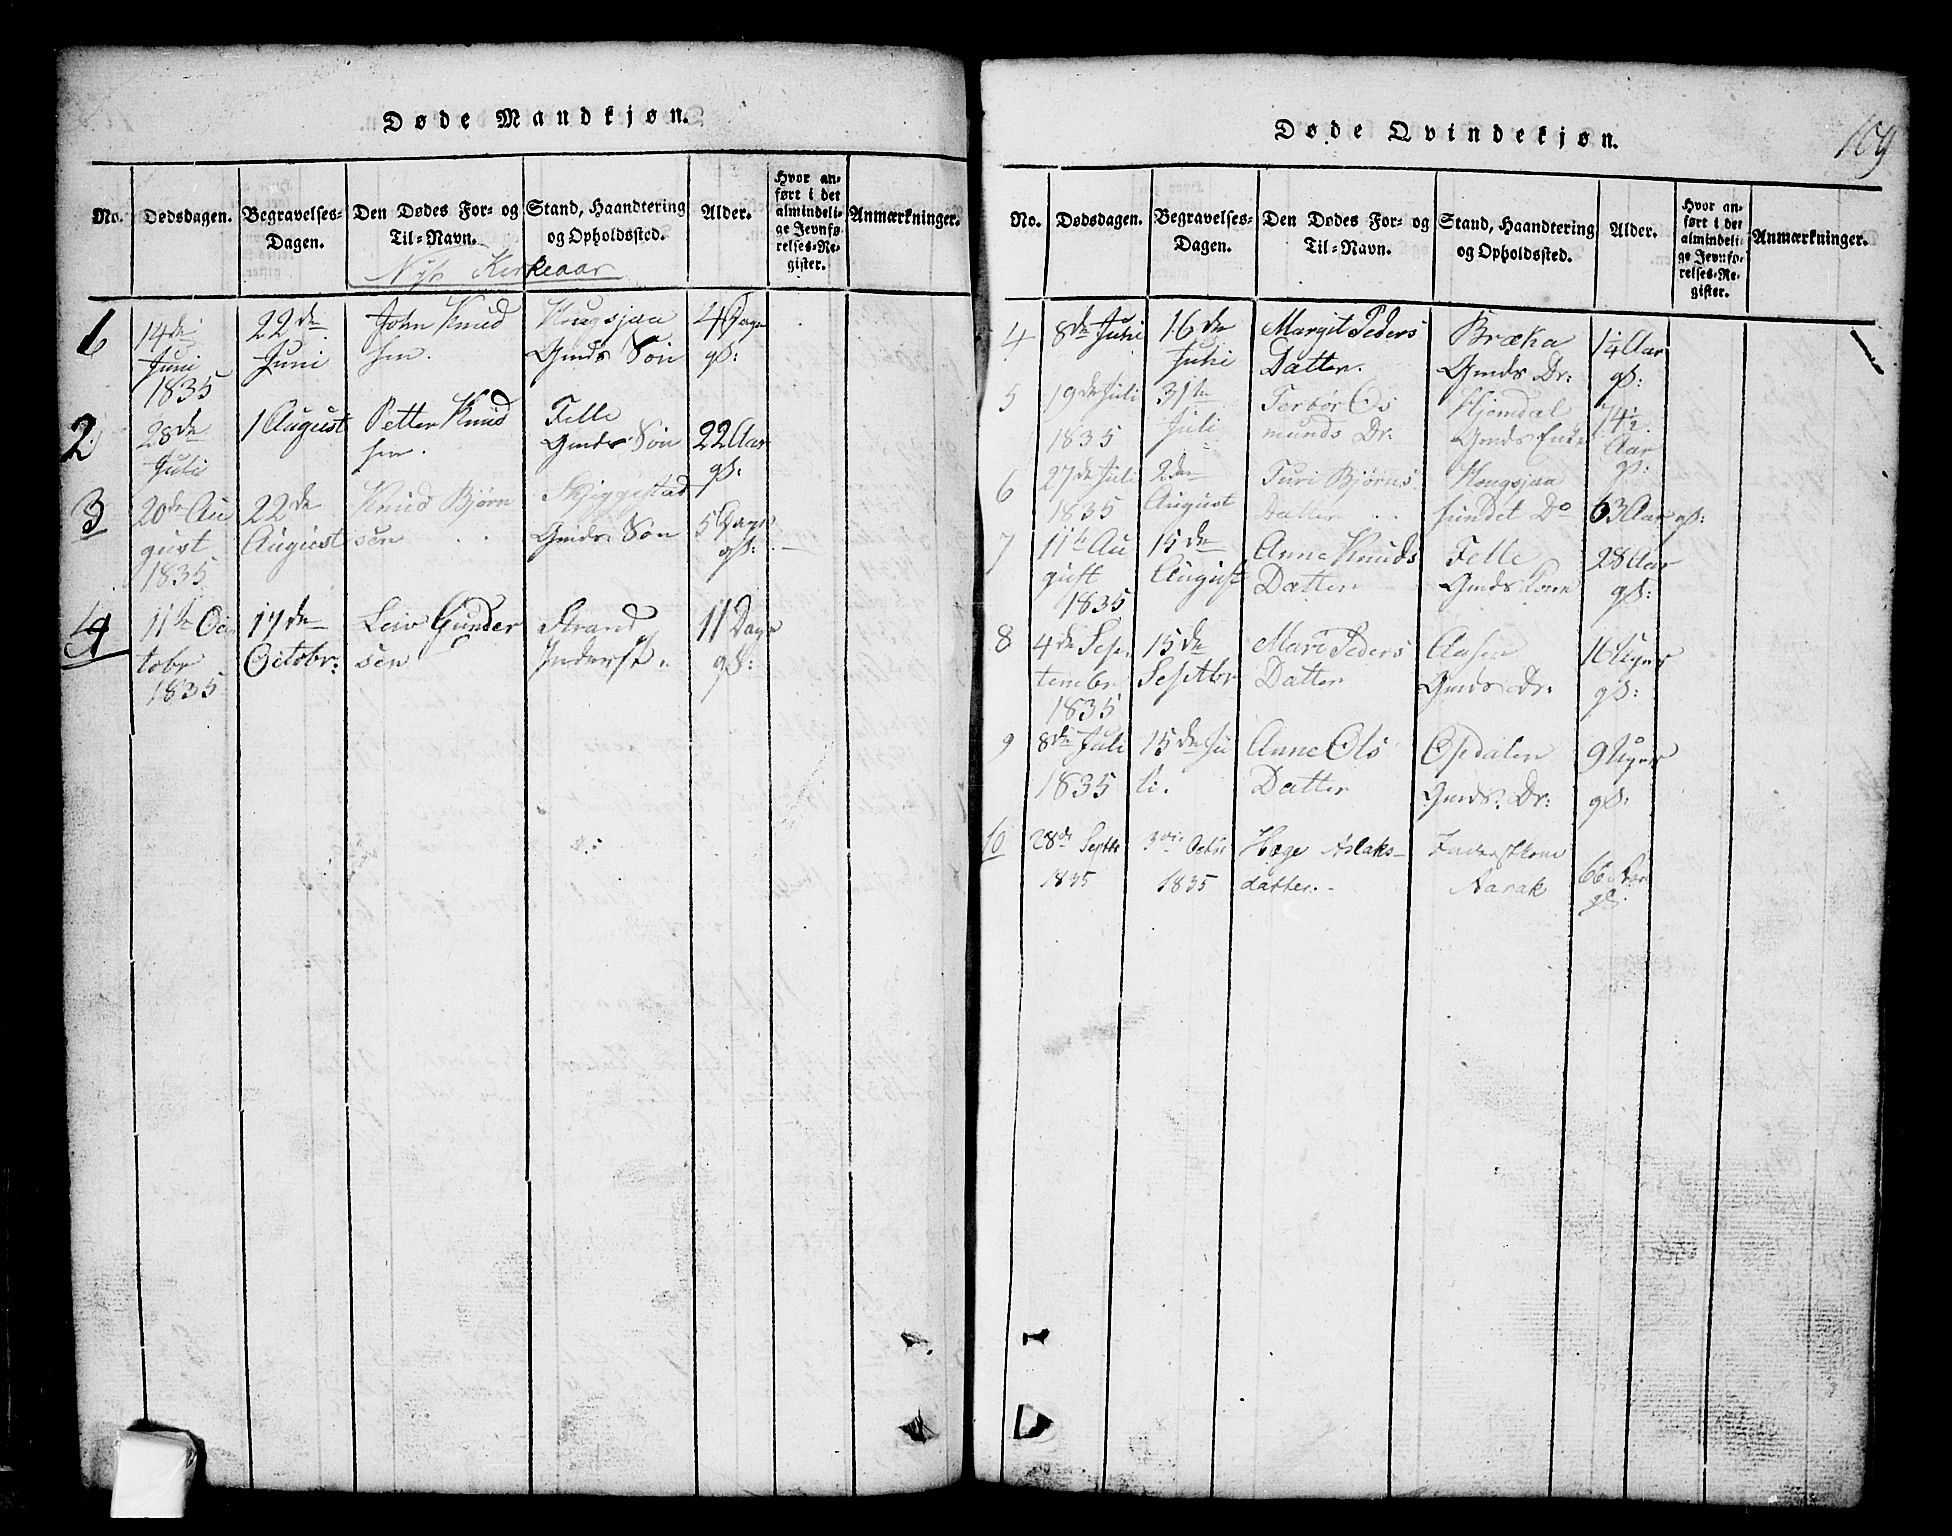 SAKO, Nissedal kirkebøker, G/Gb/L0001: Klokkerbok nr. II 1, 1814-1862, s. 109